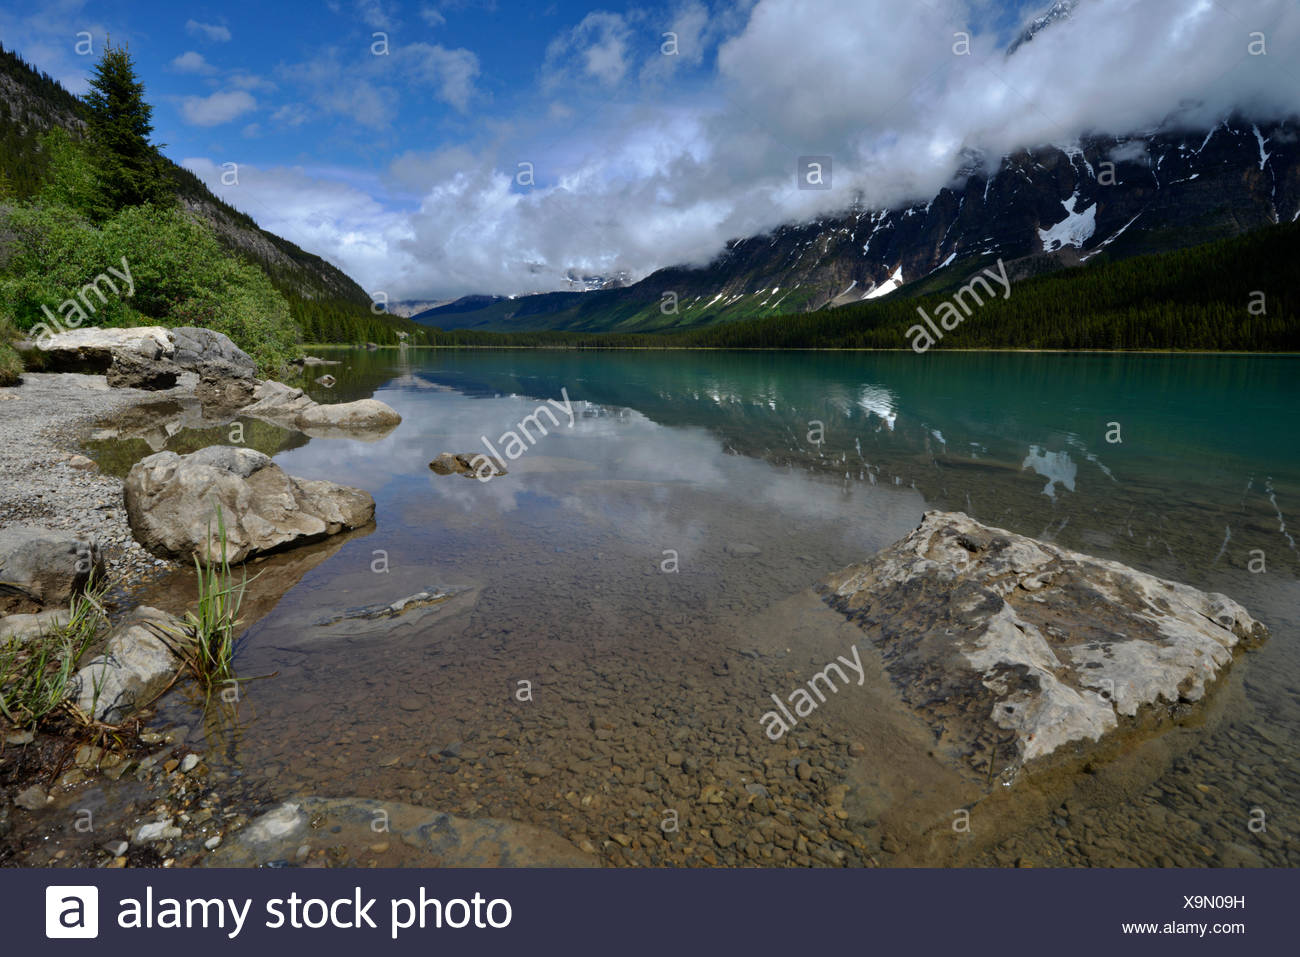 Waterfowl Lake and Mount Chephren, Banff National Park, Canada - Stock Image